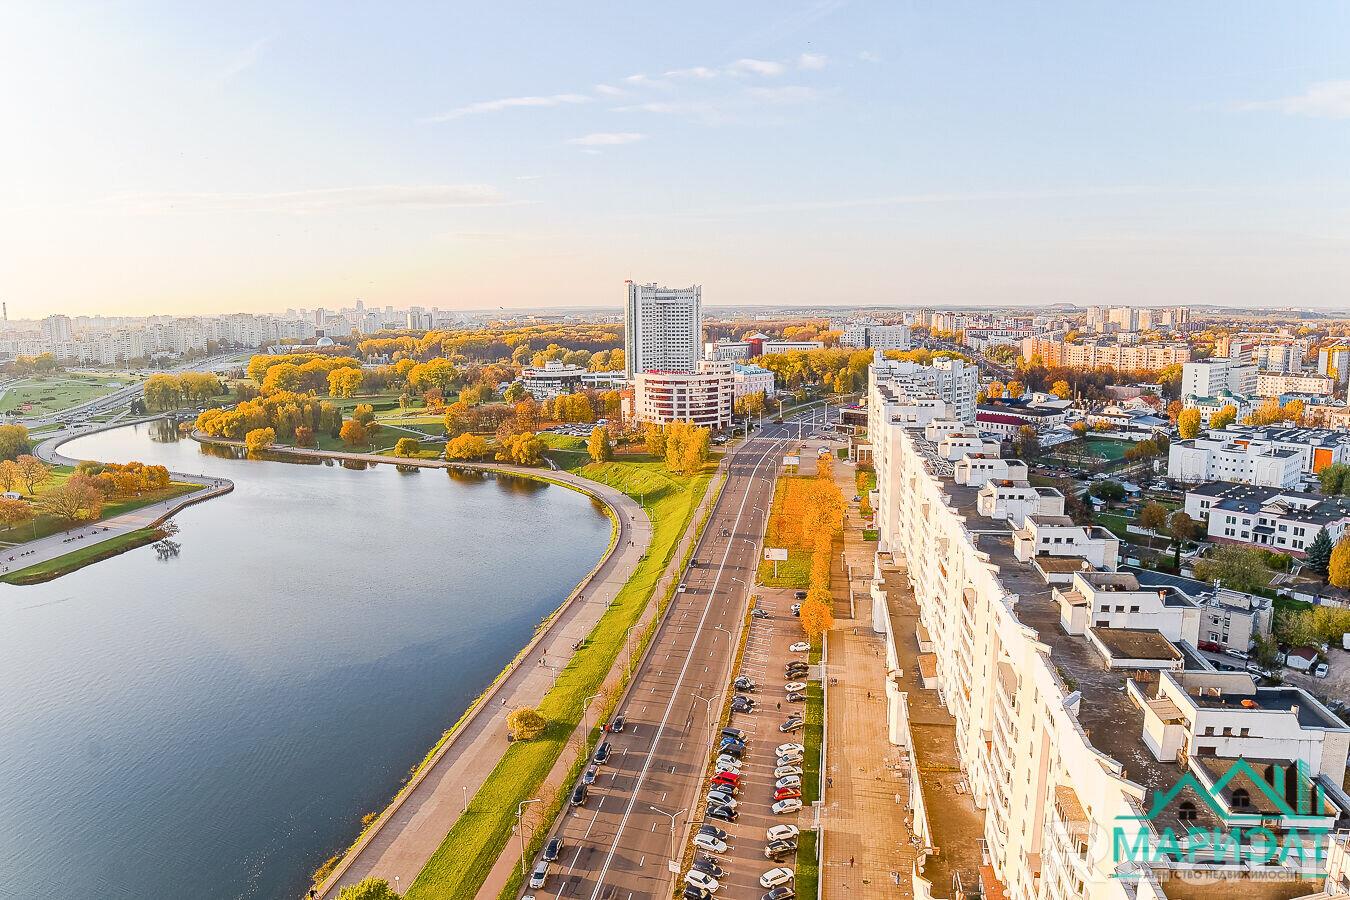 Продается 4-х комнатная квартира, ул. Сторожовская д.6 - фото №32